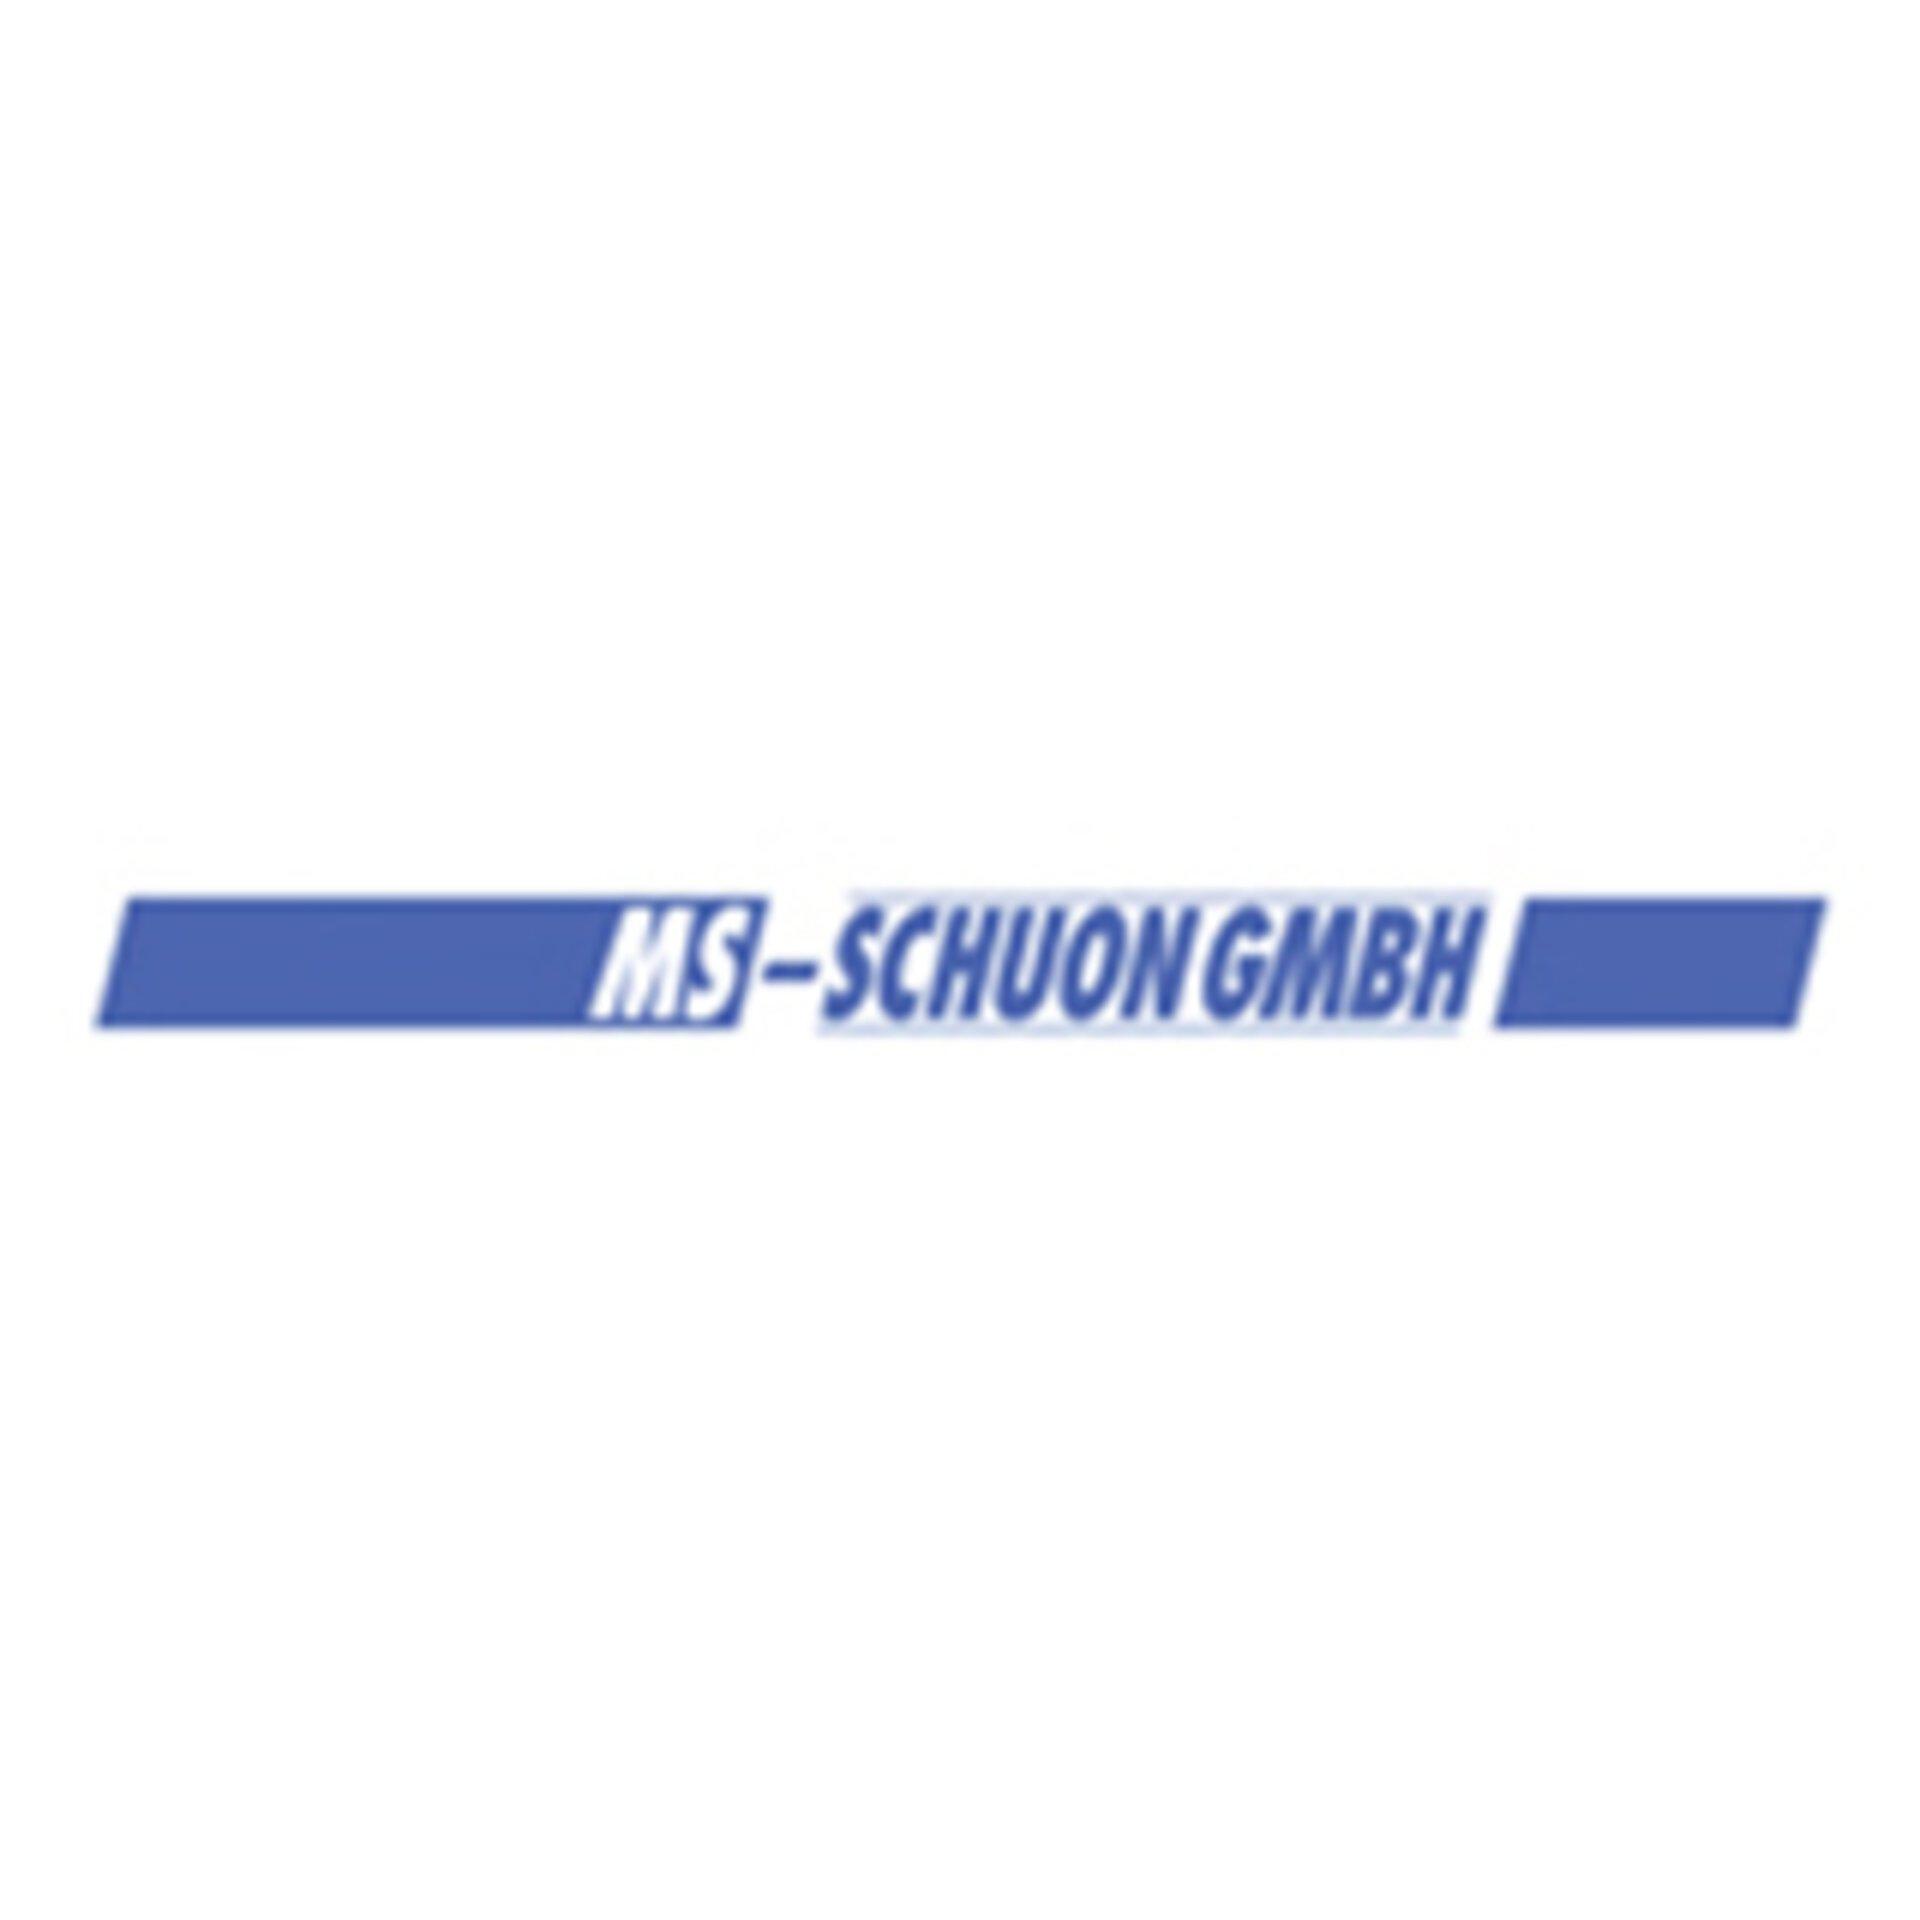 MS-Schuon